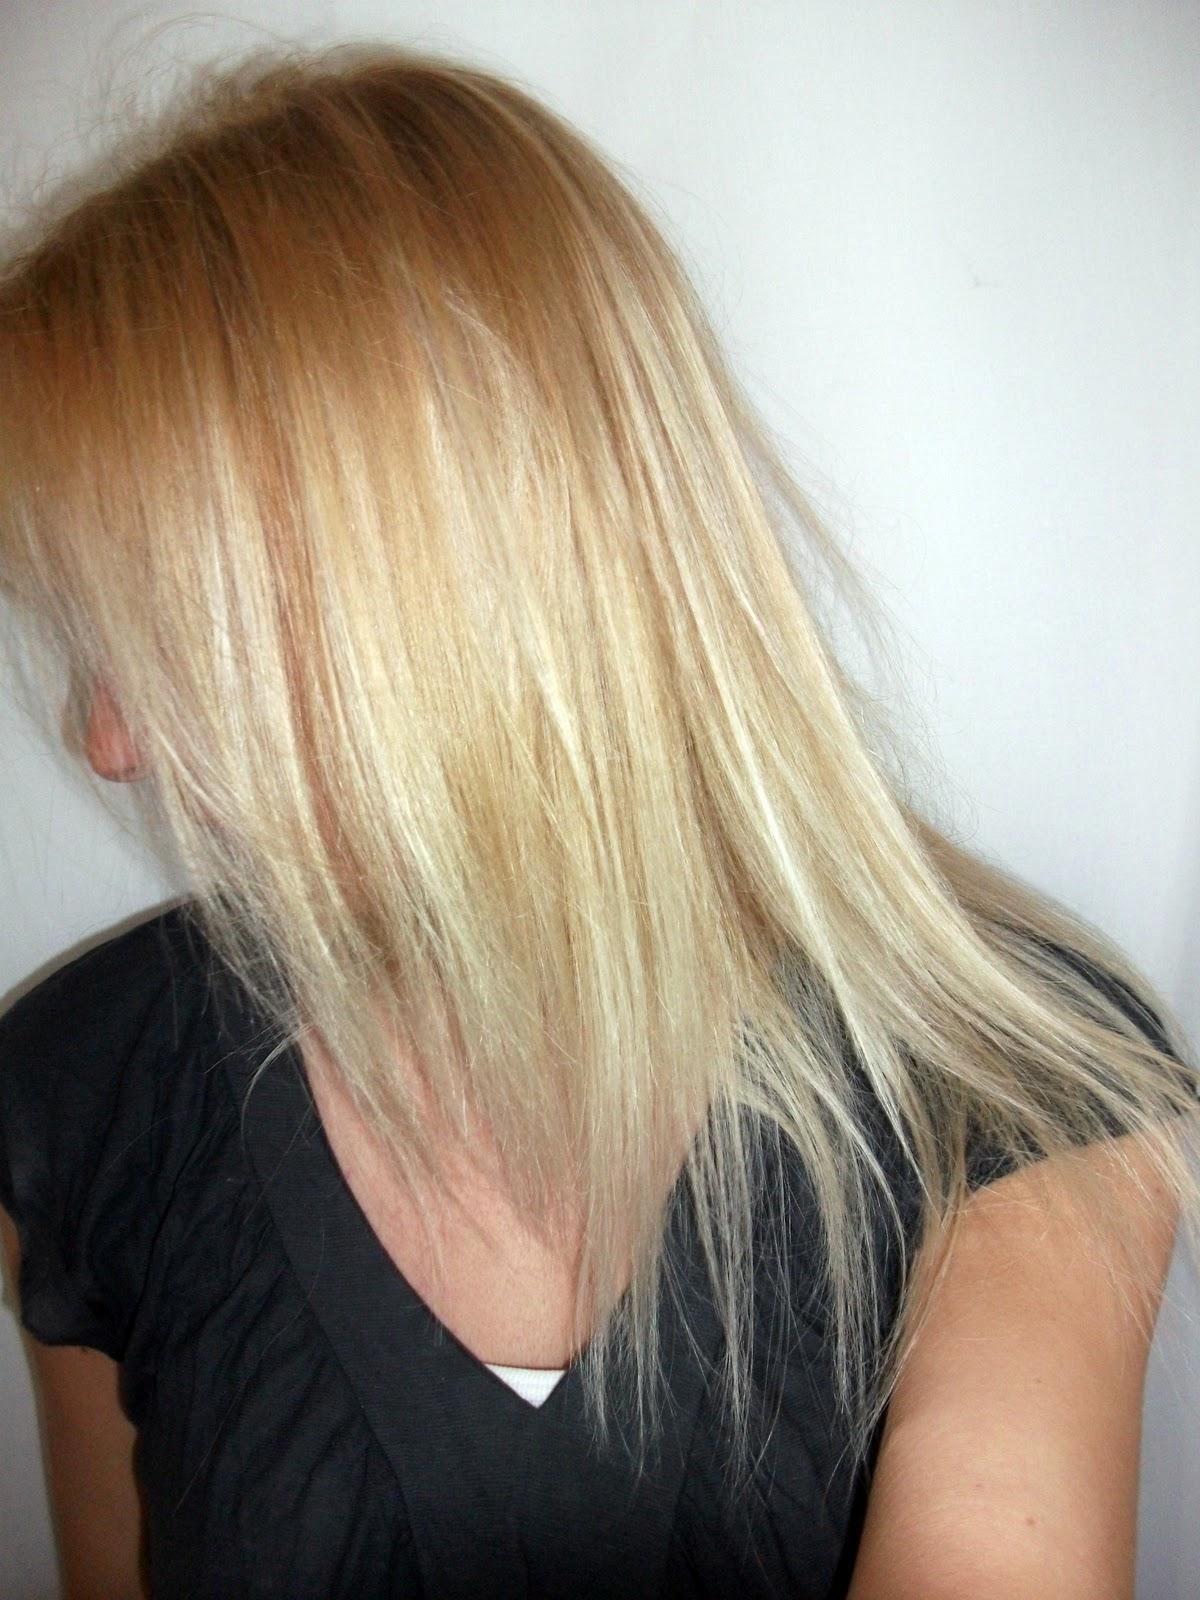 Lilly Belle About Town John Frieda Precision Foam Hair